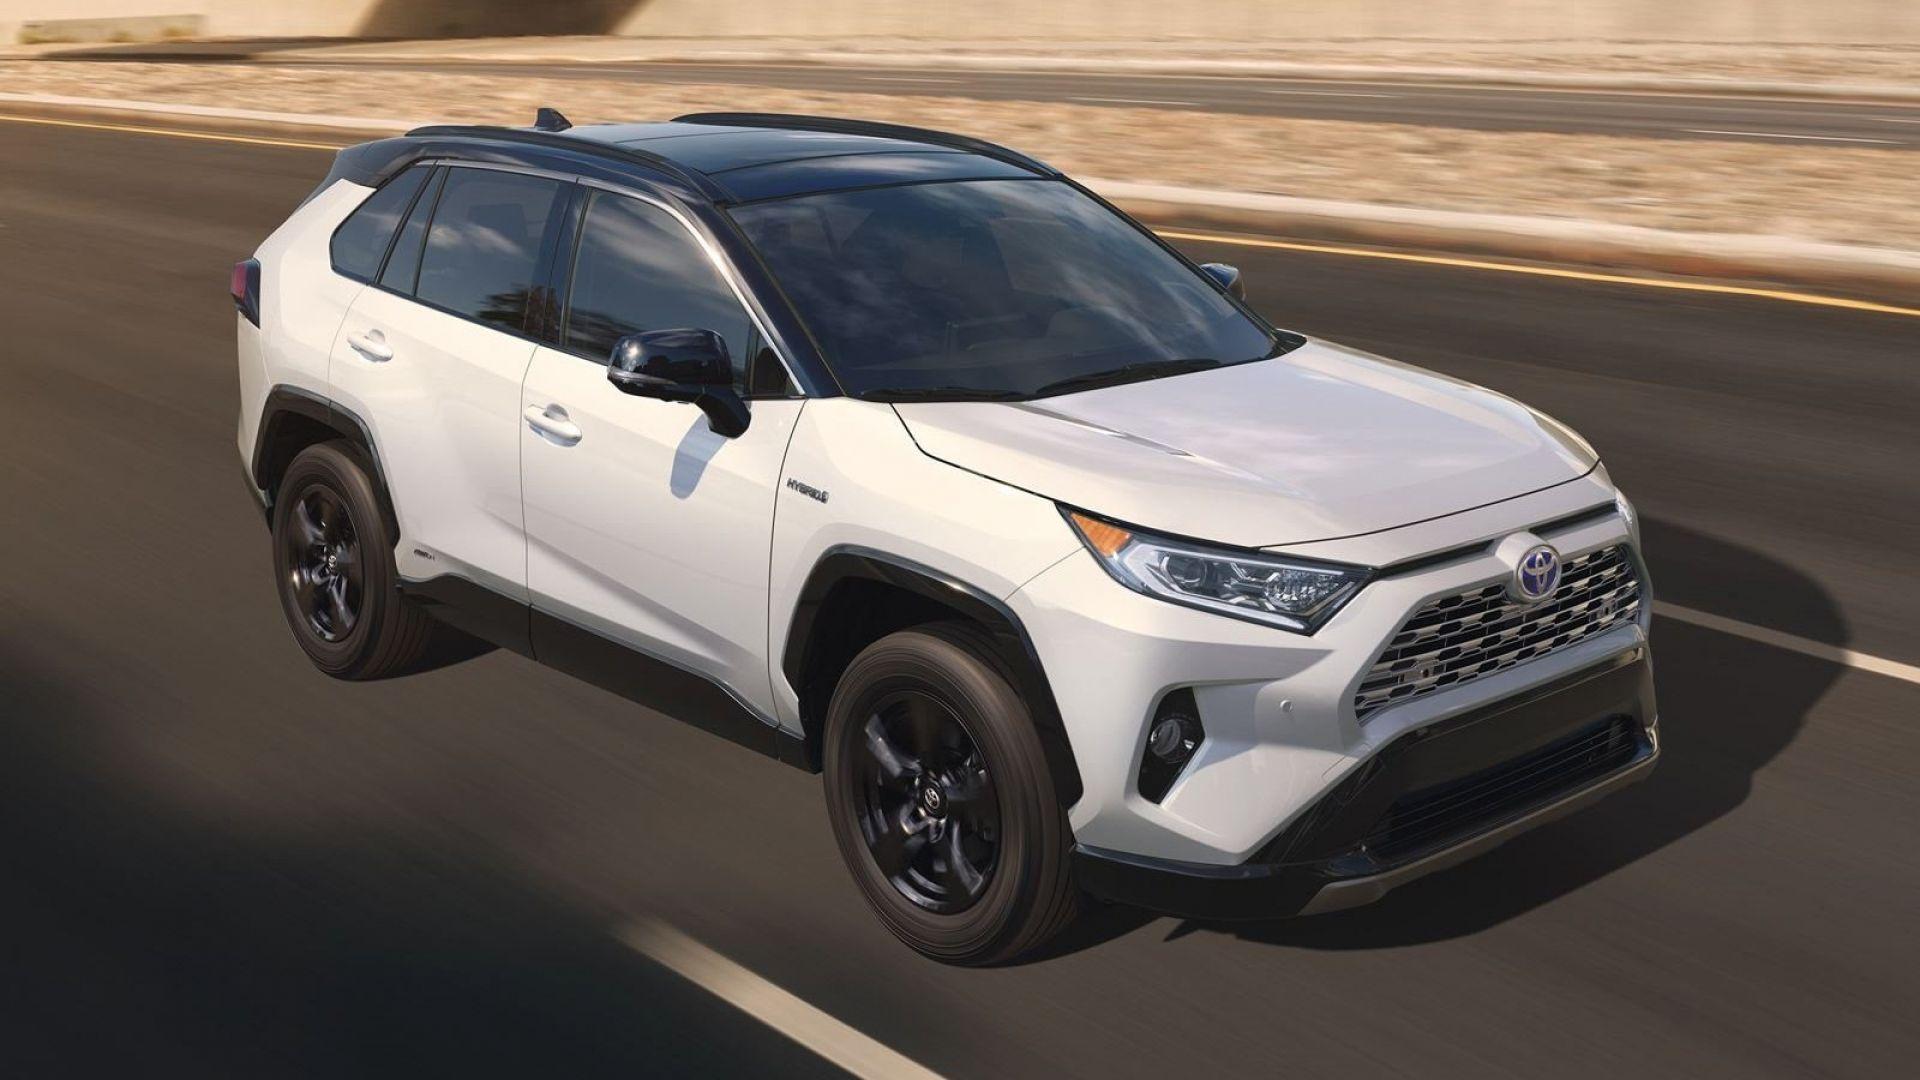 Rav4 Hybrid Prezzo >> Toyota Rav4 ibrida 2019: dimensioni, scheda tecnica, prezzo, video - MotorBox